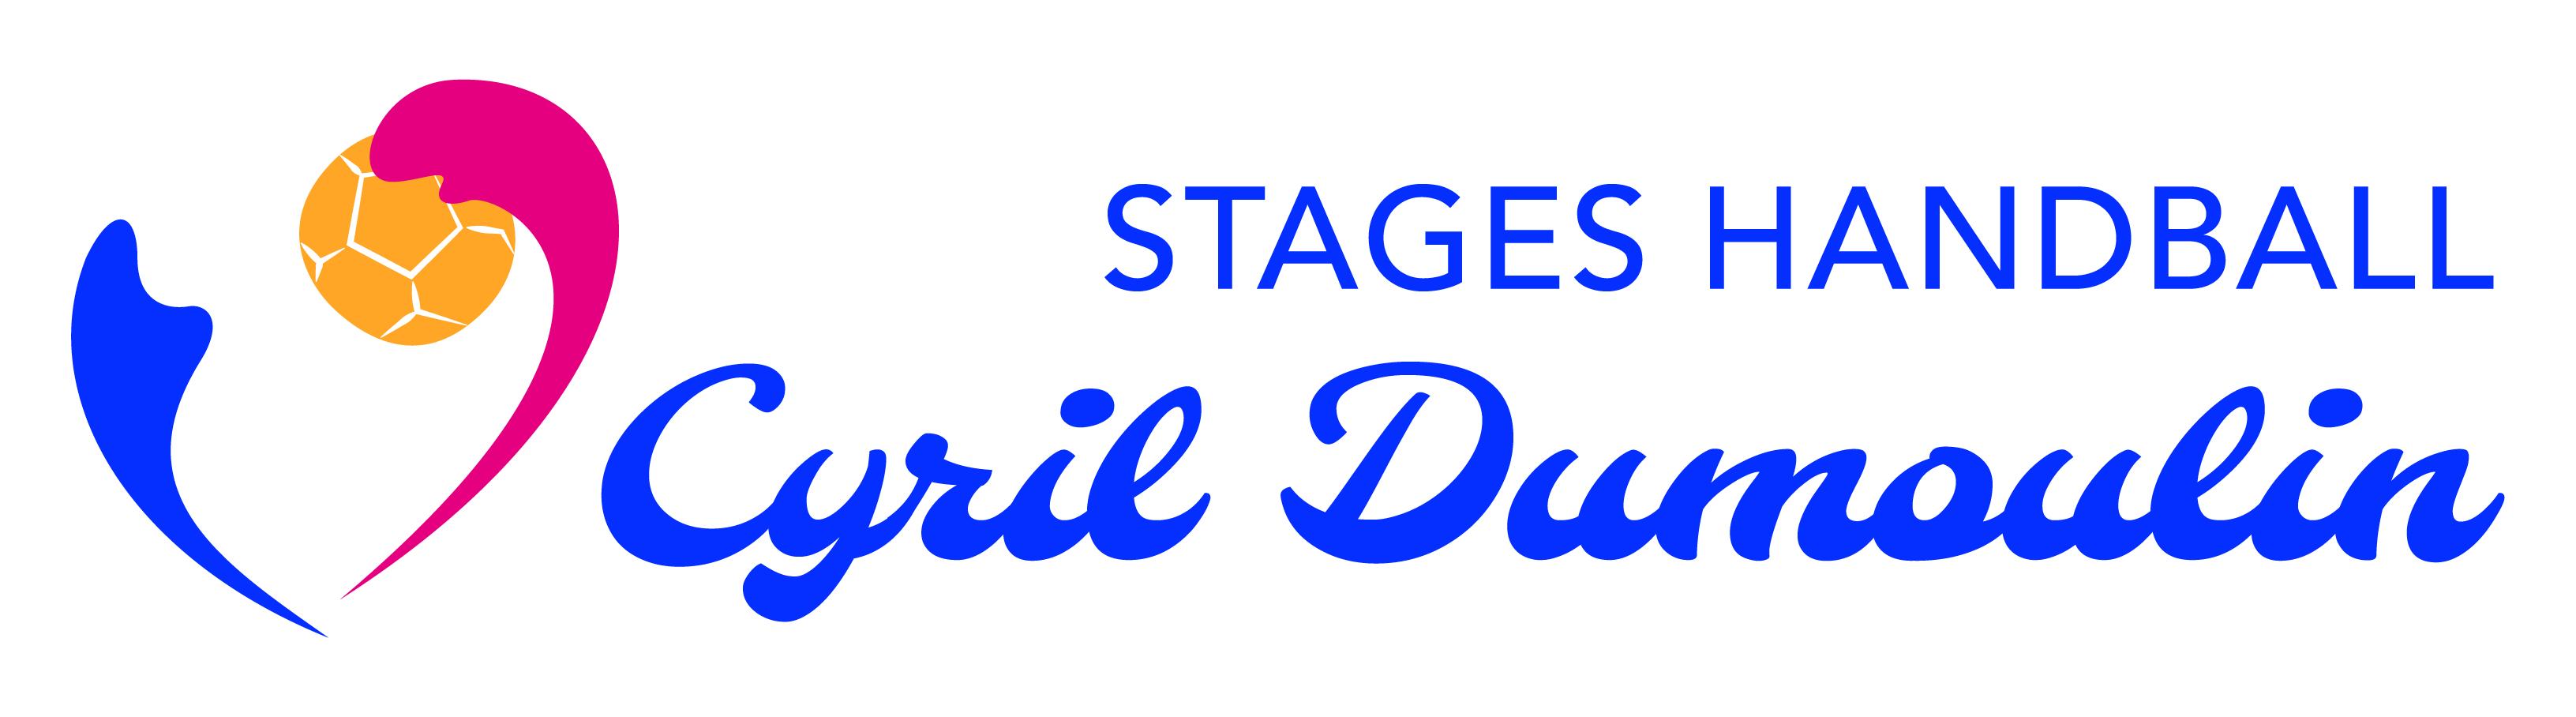 logo-StagesHandball-neutre-1